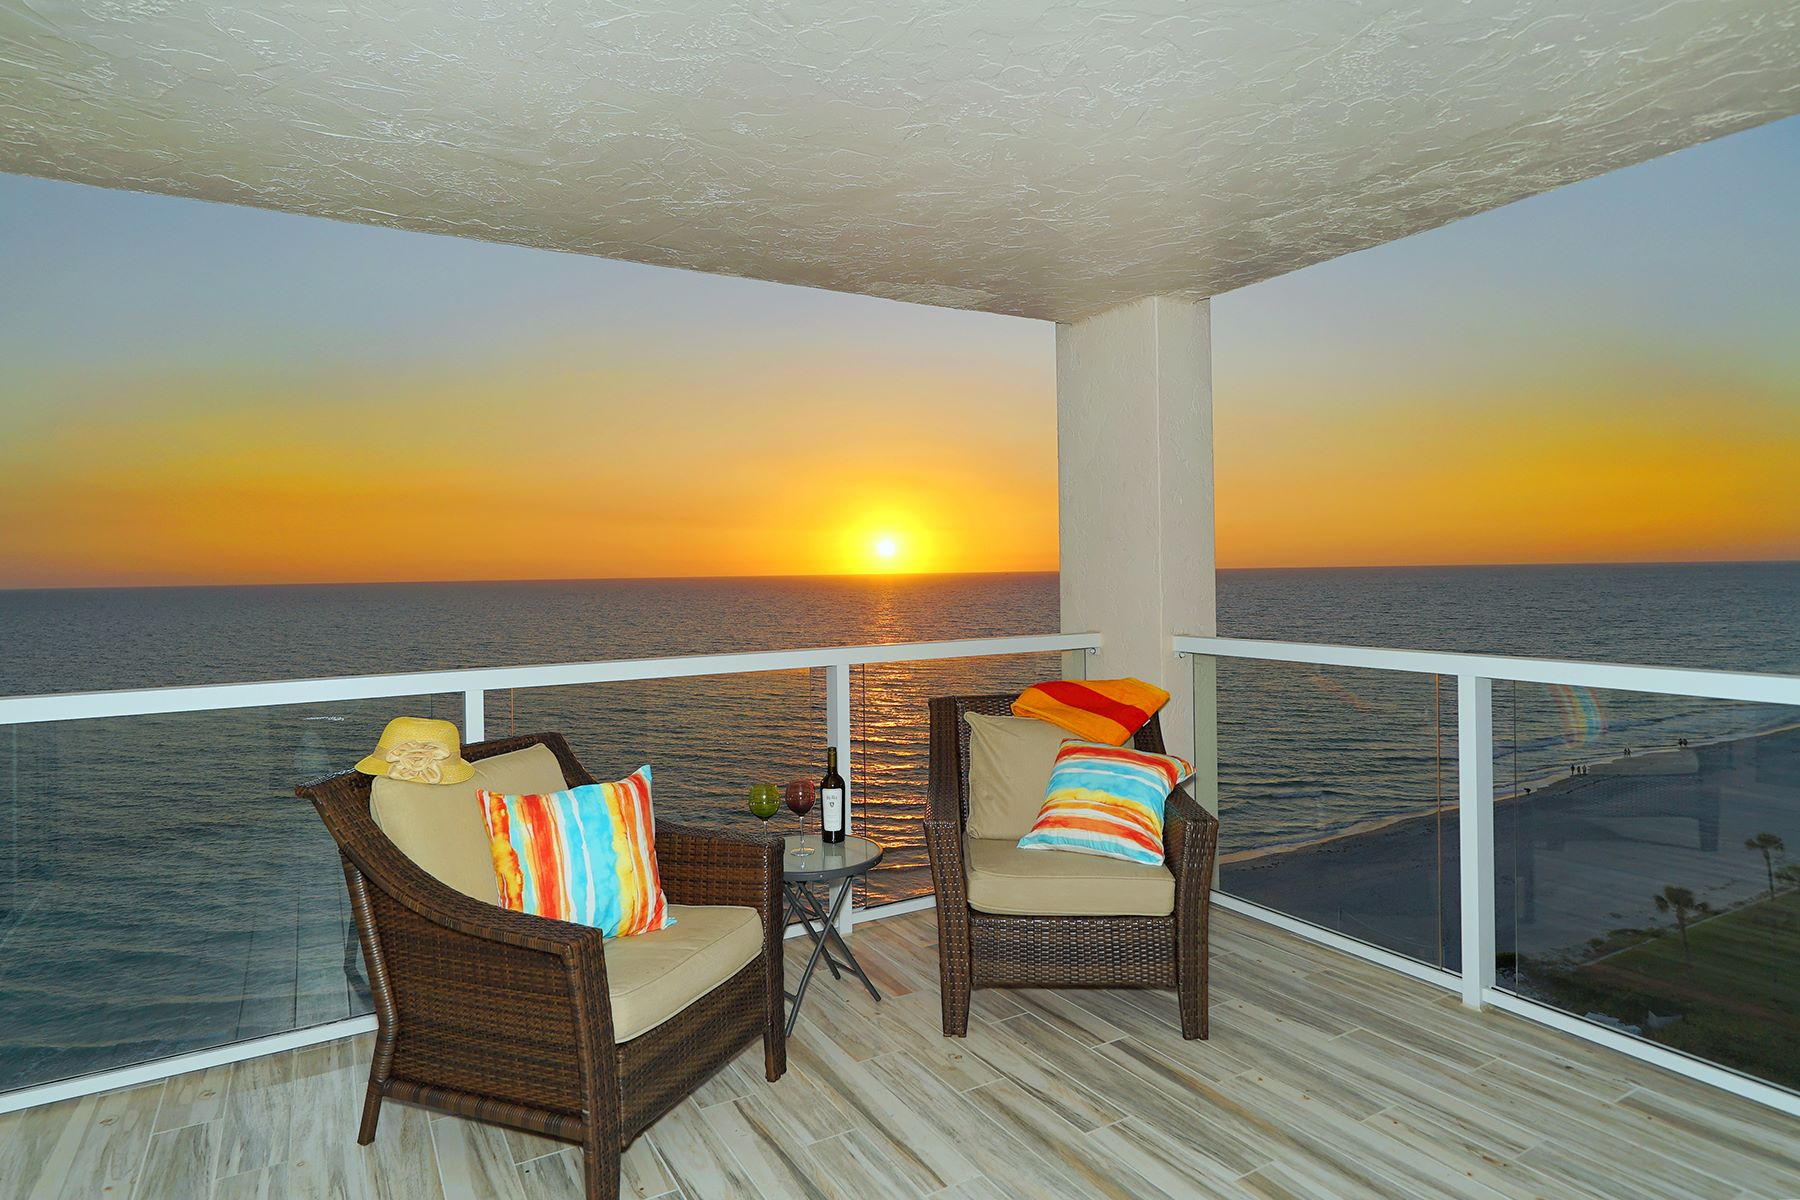 Condominium for Sale at LONGBOAT KEY 2425 Gulf Of Mexico Dr 13F Longboat Key, Florida, 34228 United States